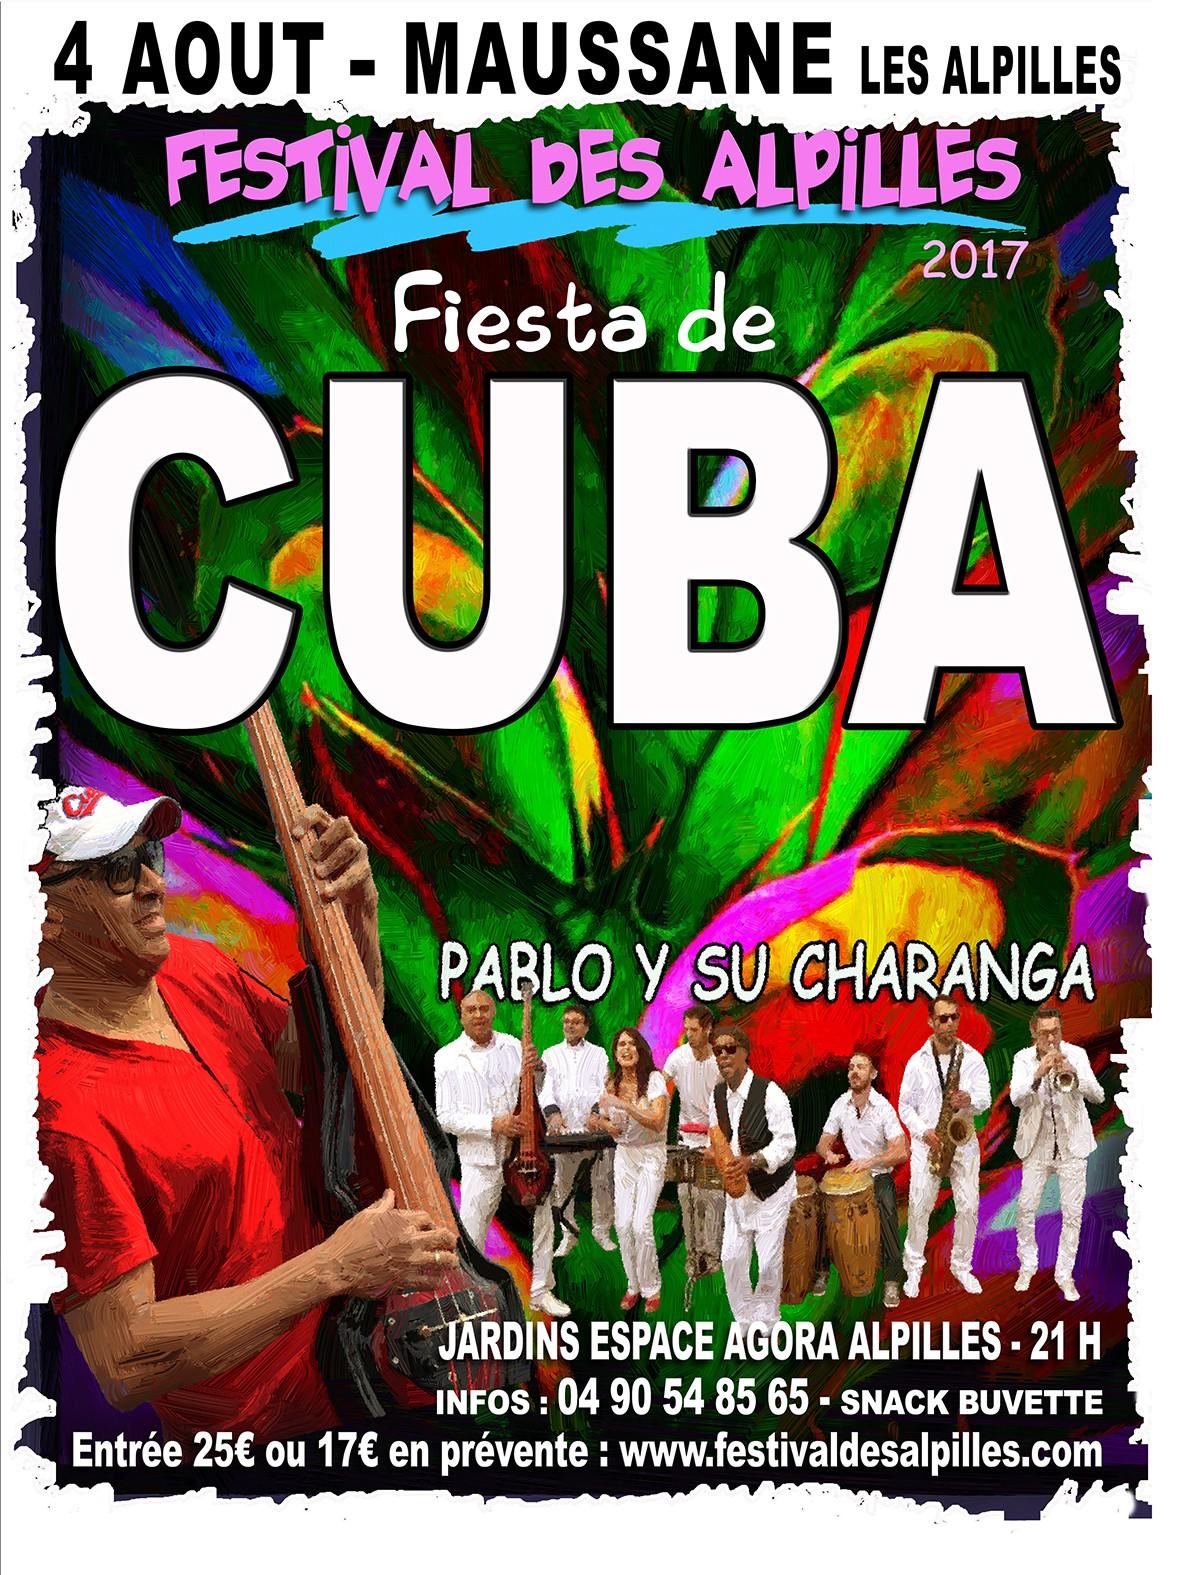 Festival des alpilles fiesta de cuba office de tourisme maussane les alpilles office de - Office du tourisme de cuba ...